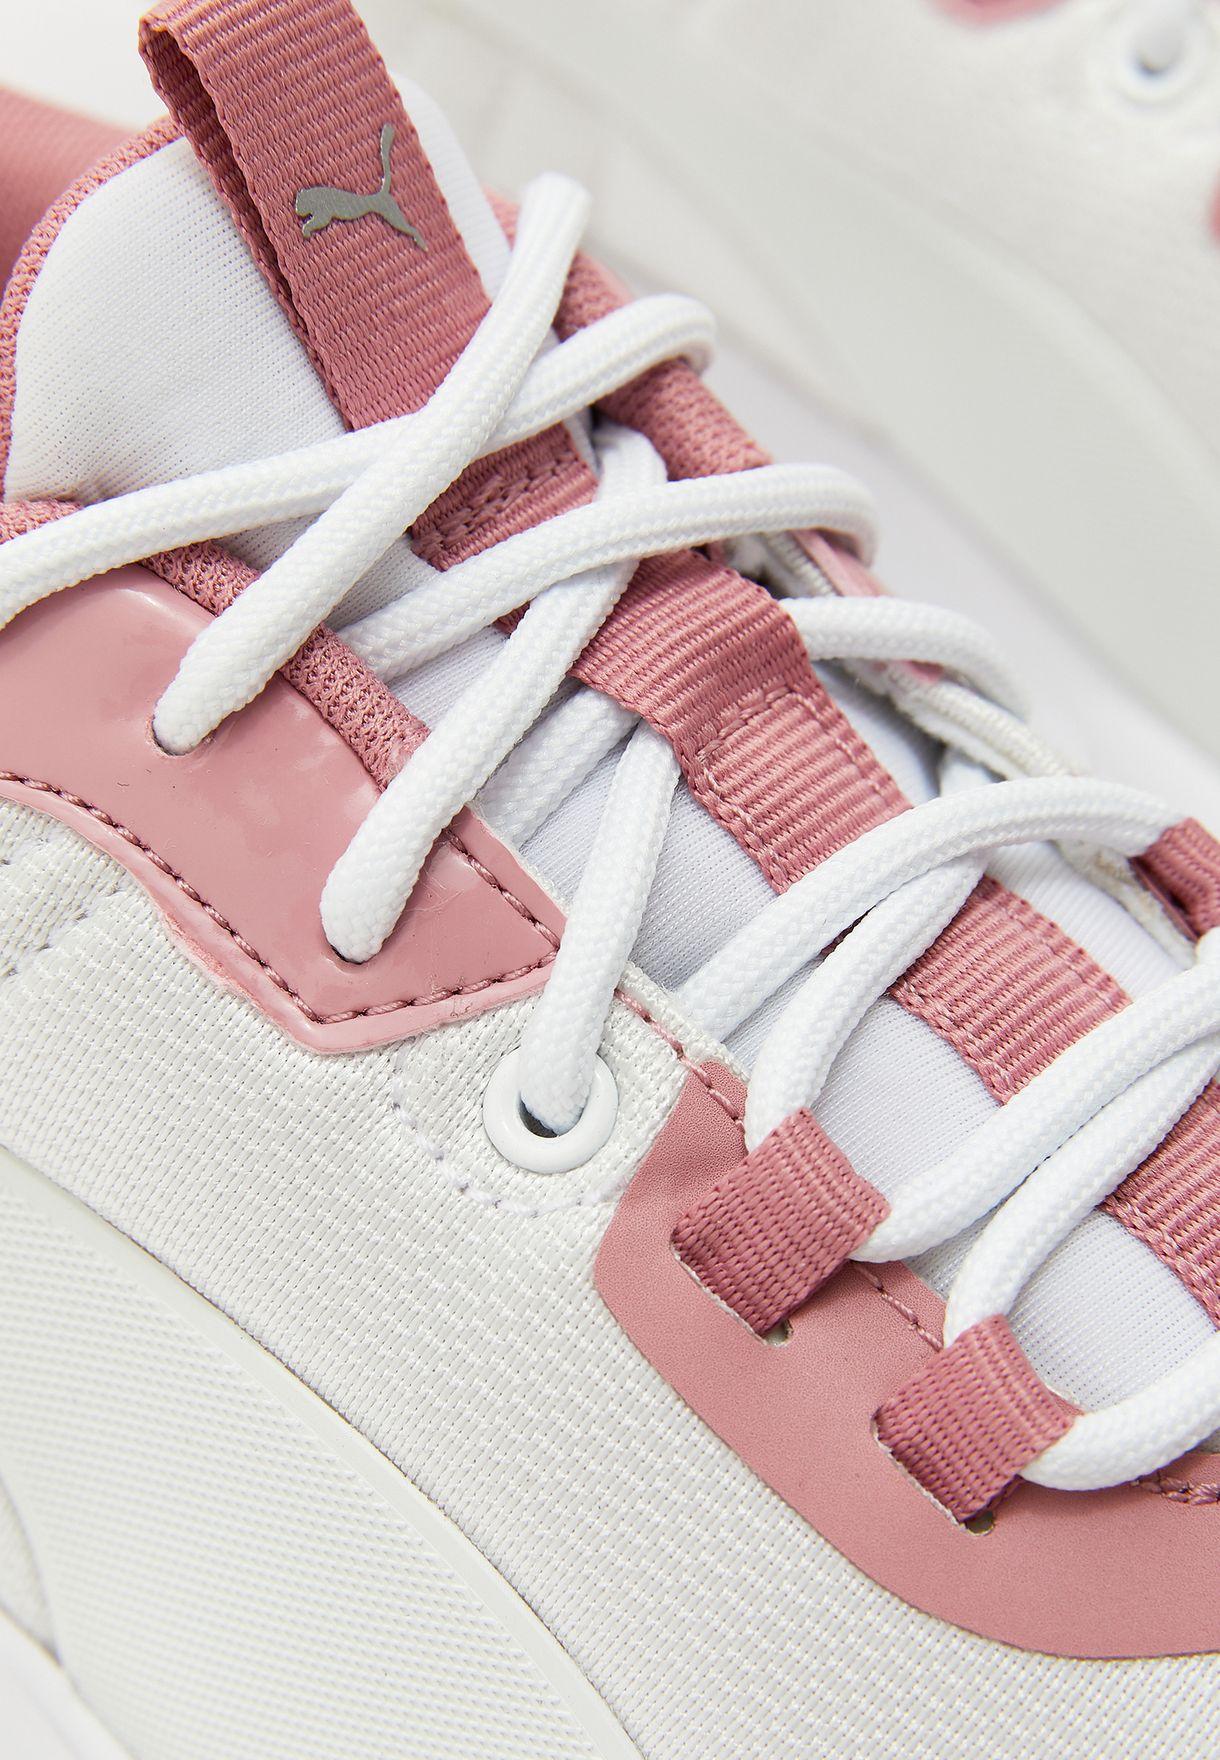 حذاء نوايج رن بيرل